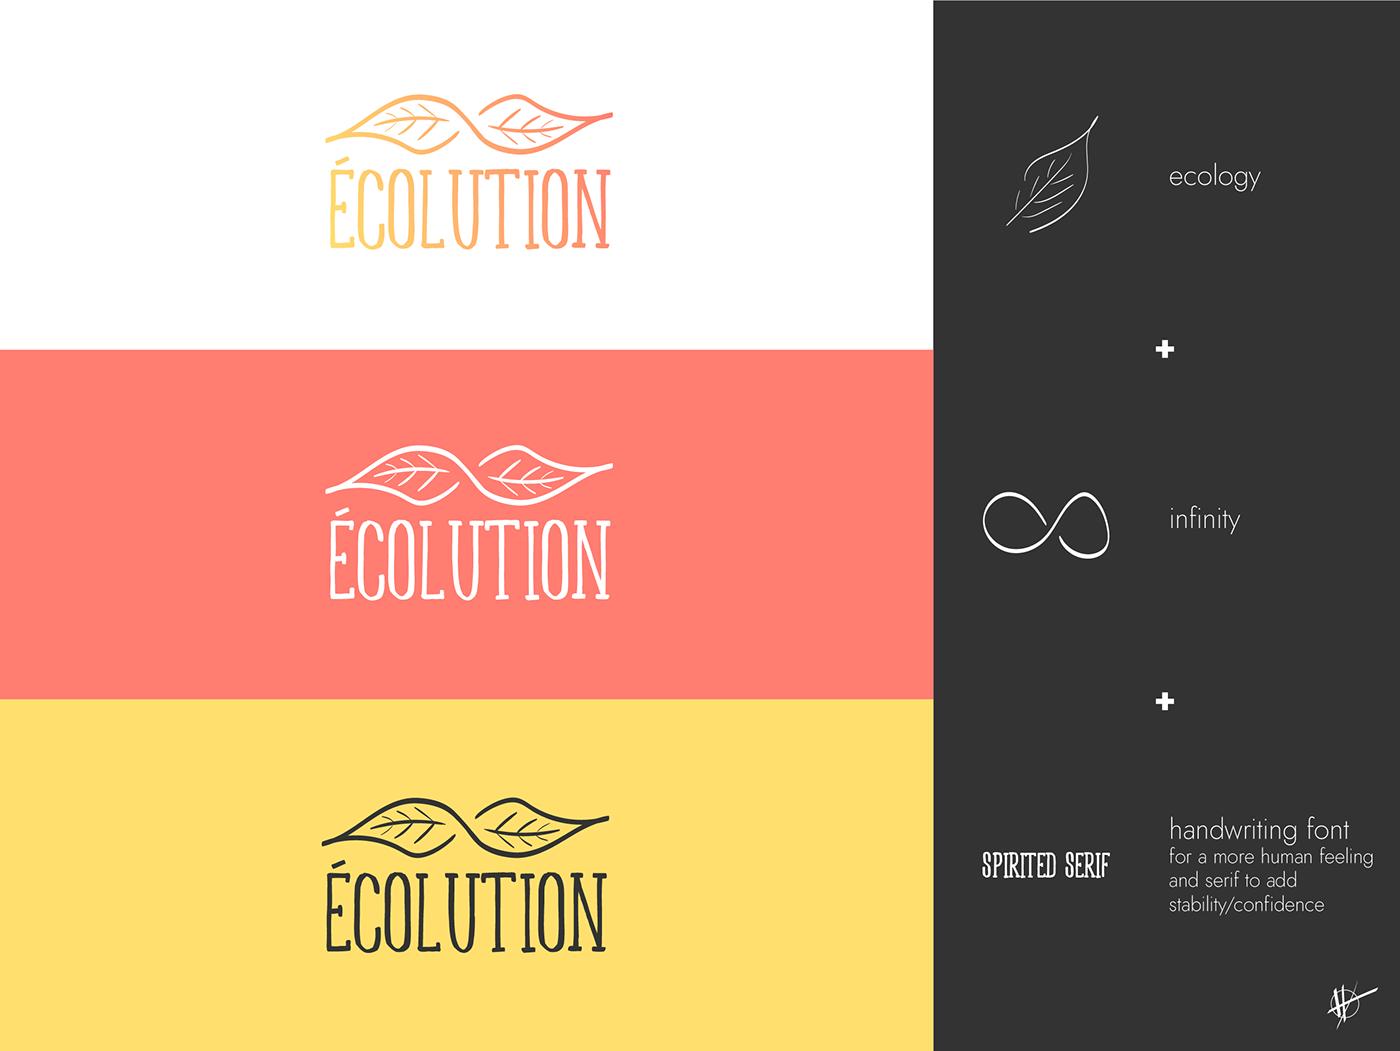 Ecology Ecolution graphic design  infinity leaf logo Logo Design